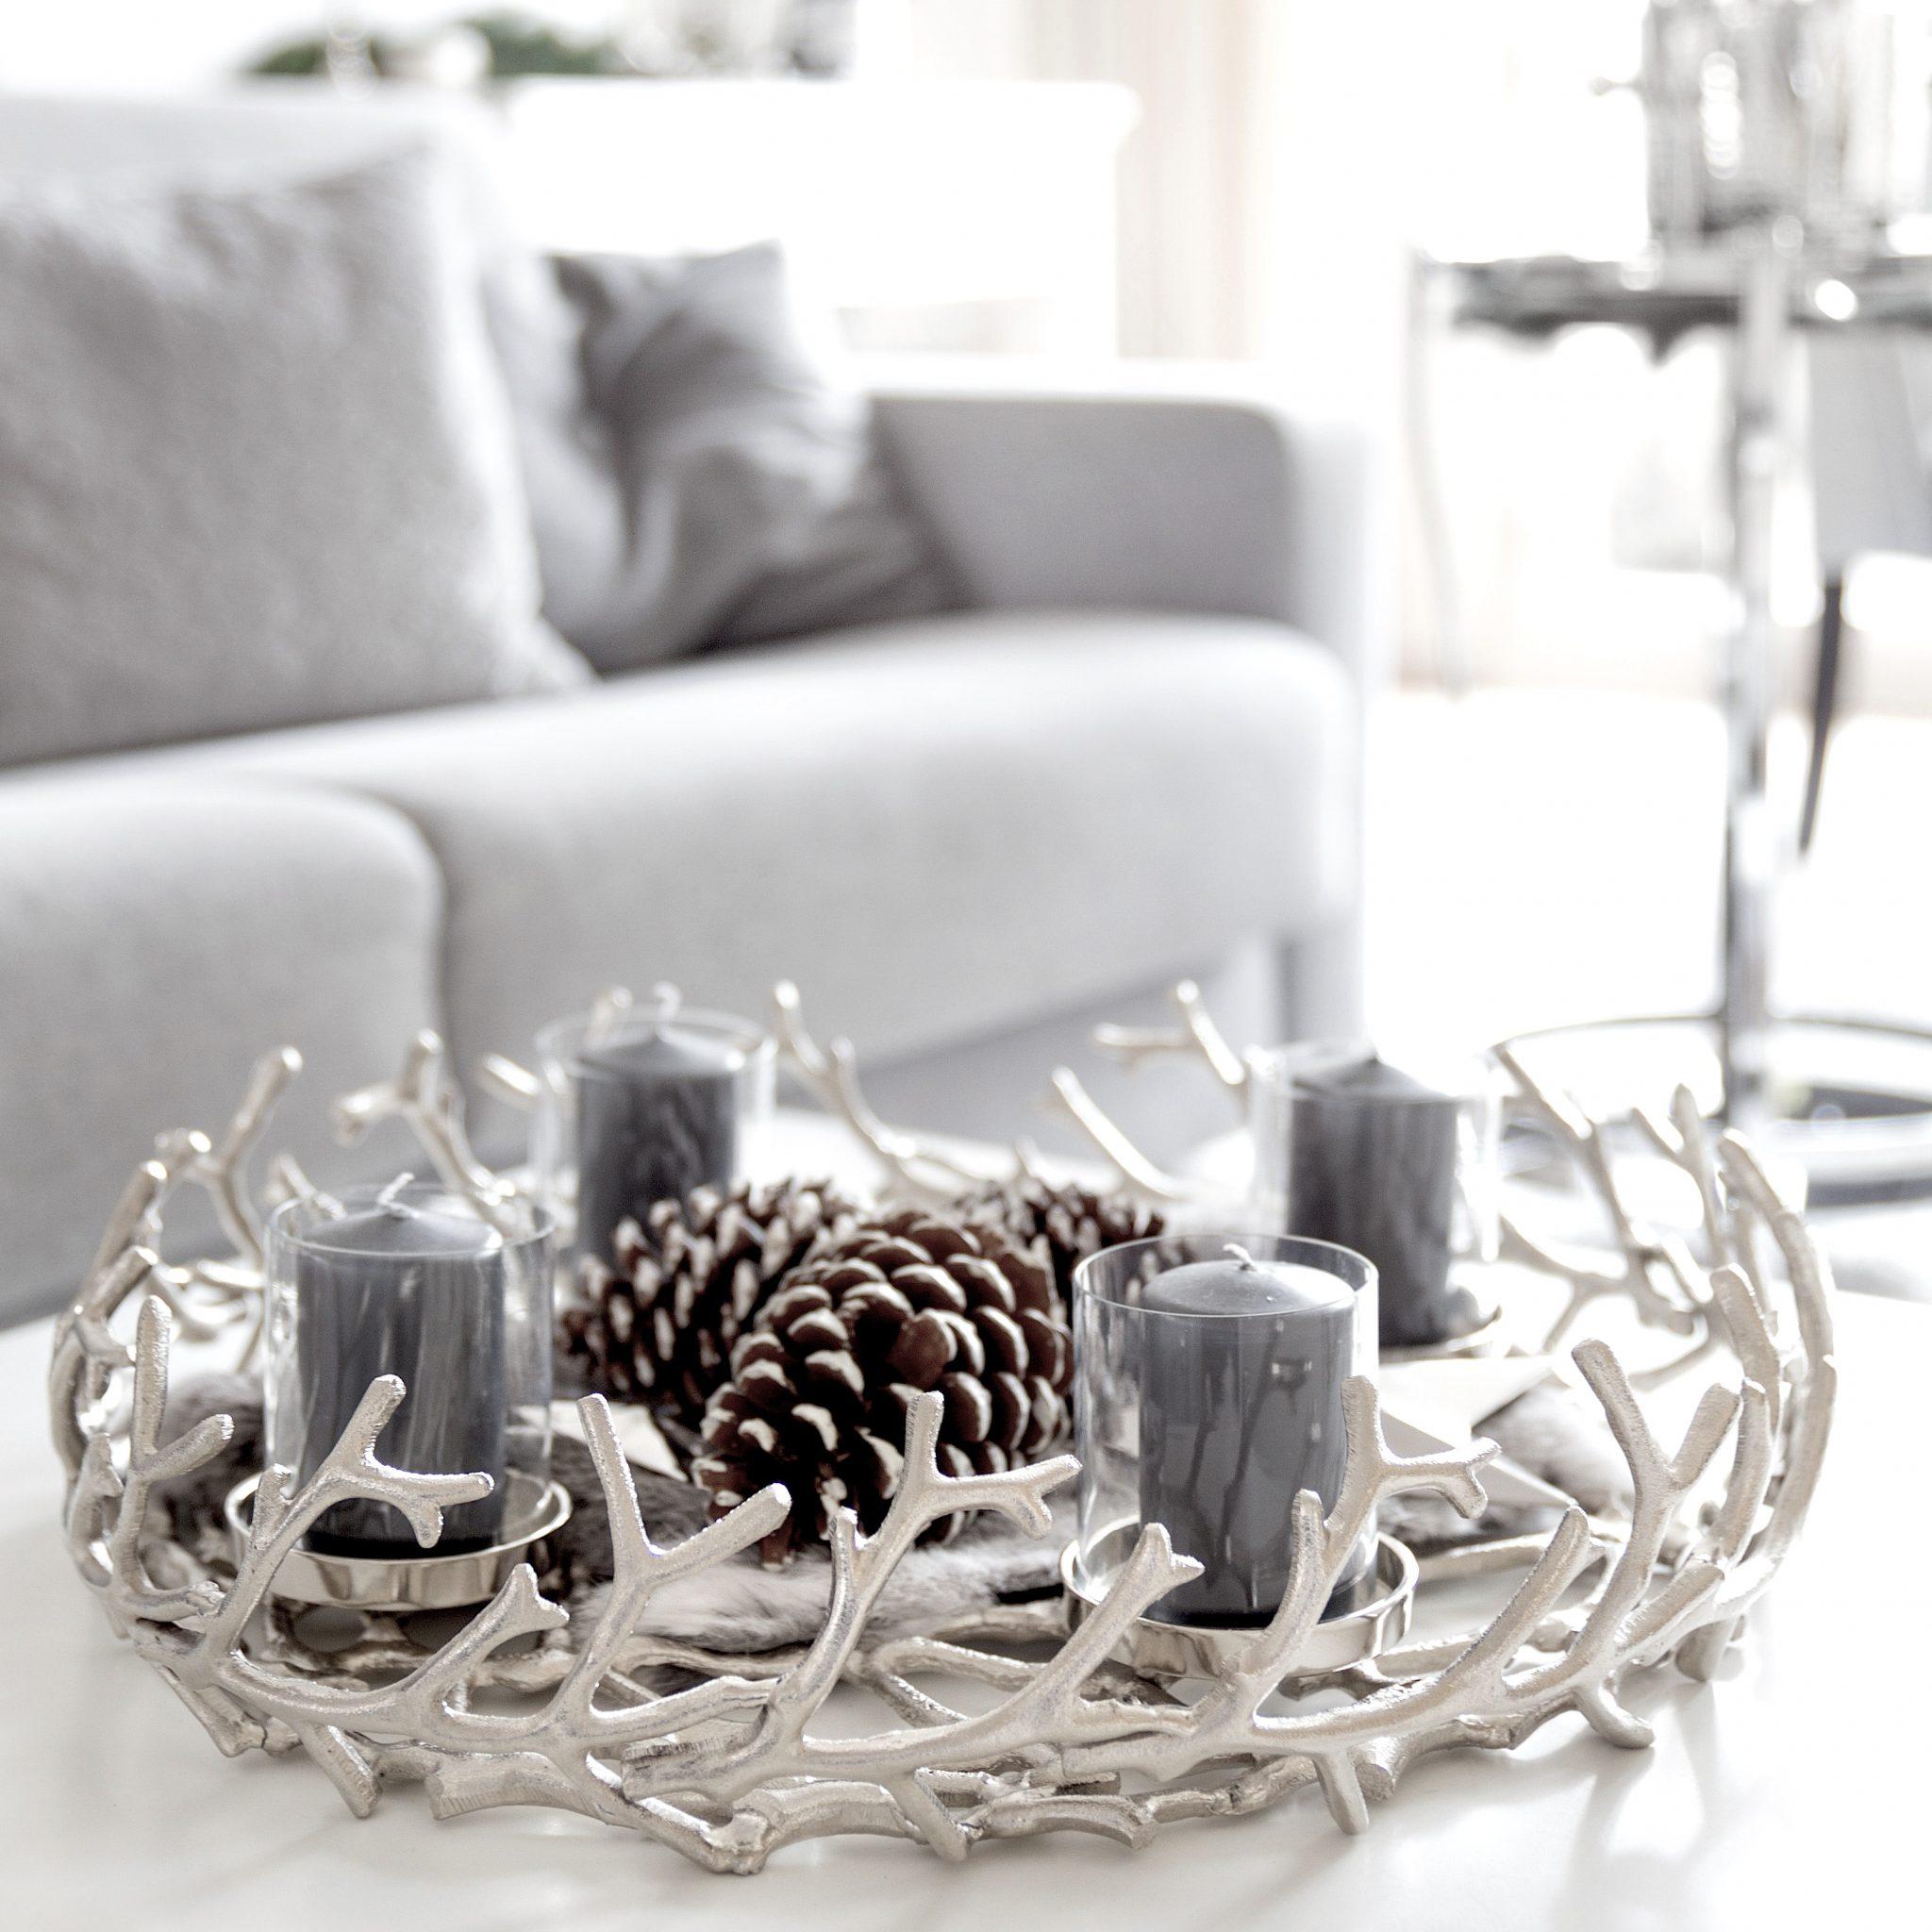 adventskranz kingston edzard 58 cm l ster laster. Black Bedroom Furniture Sets. Home Design Ideas